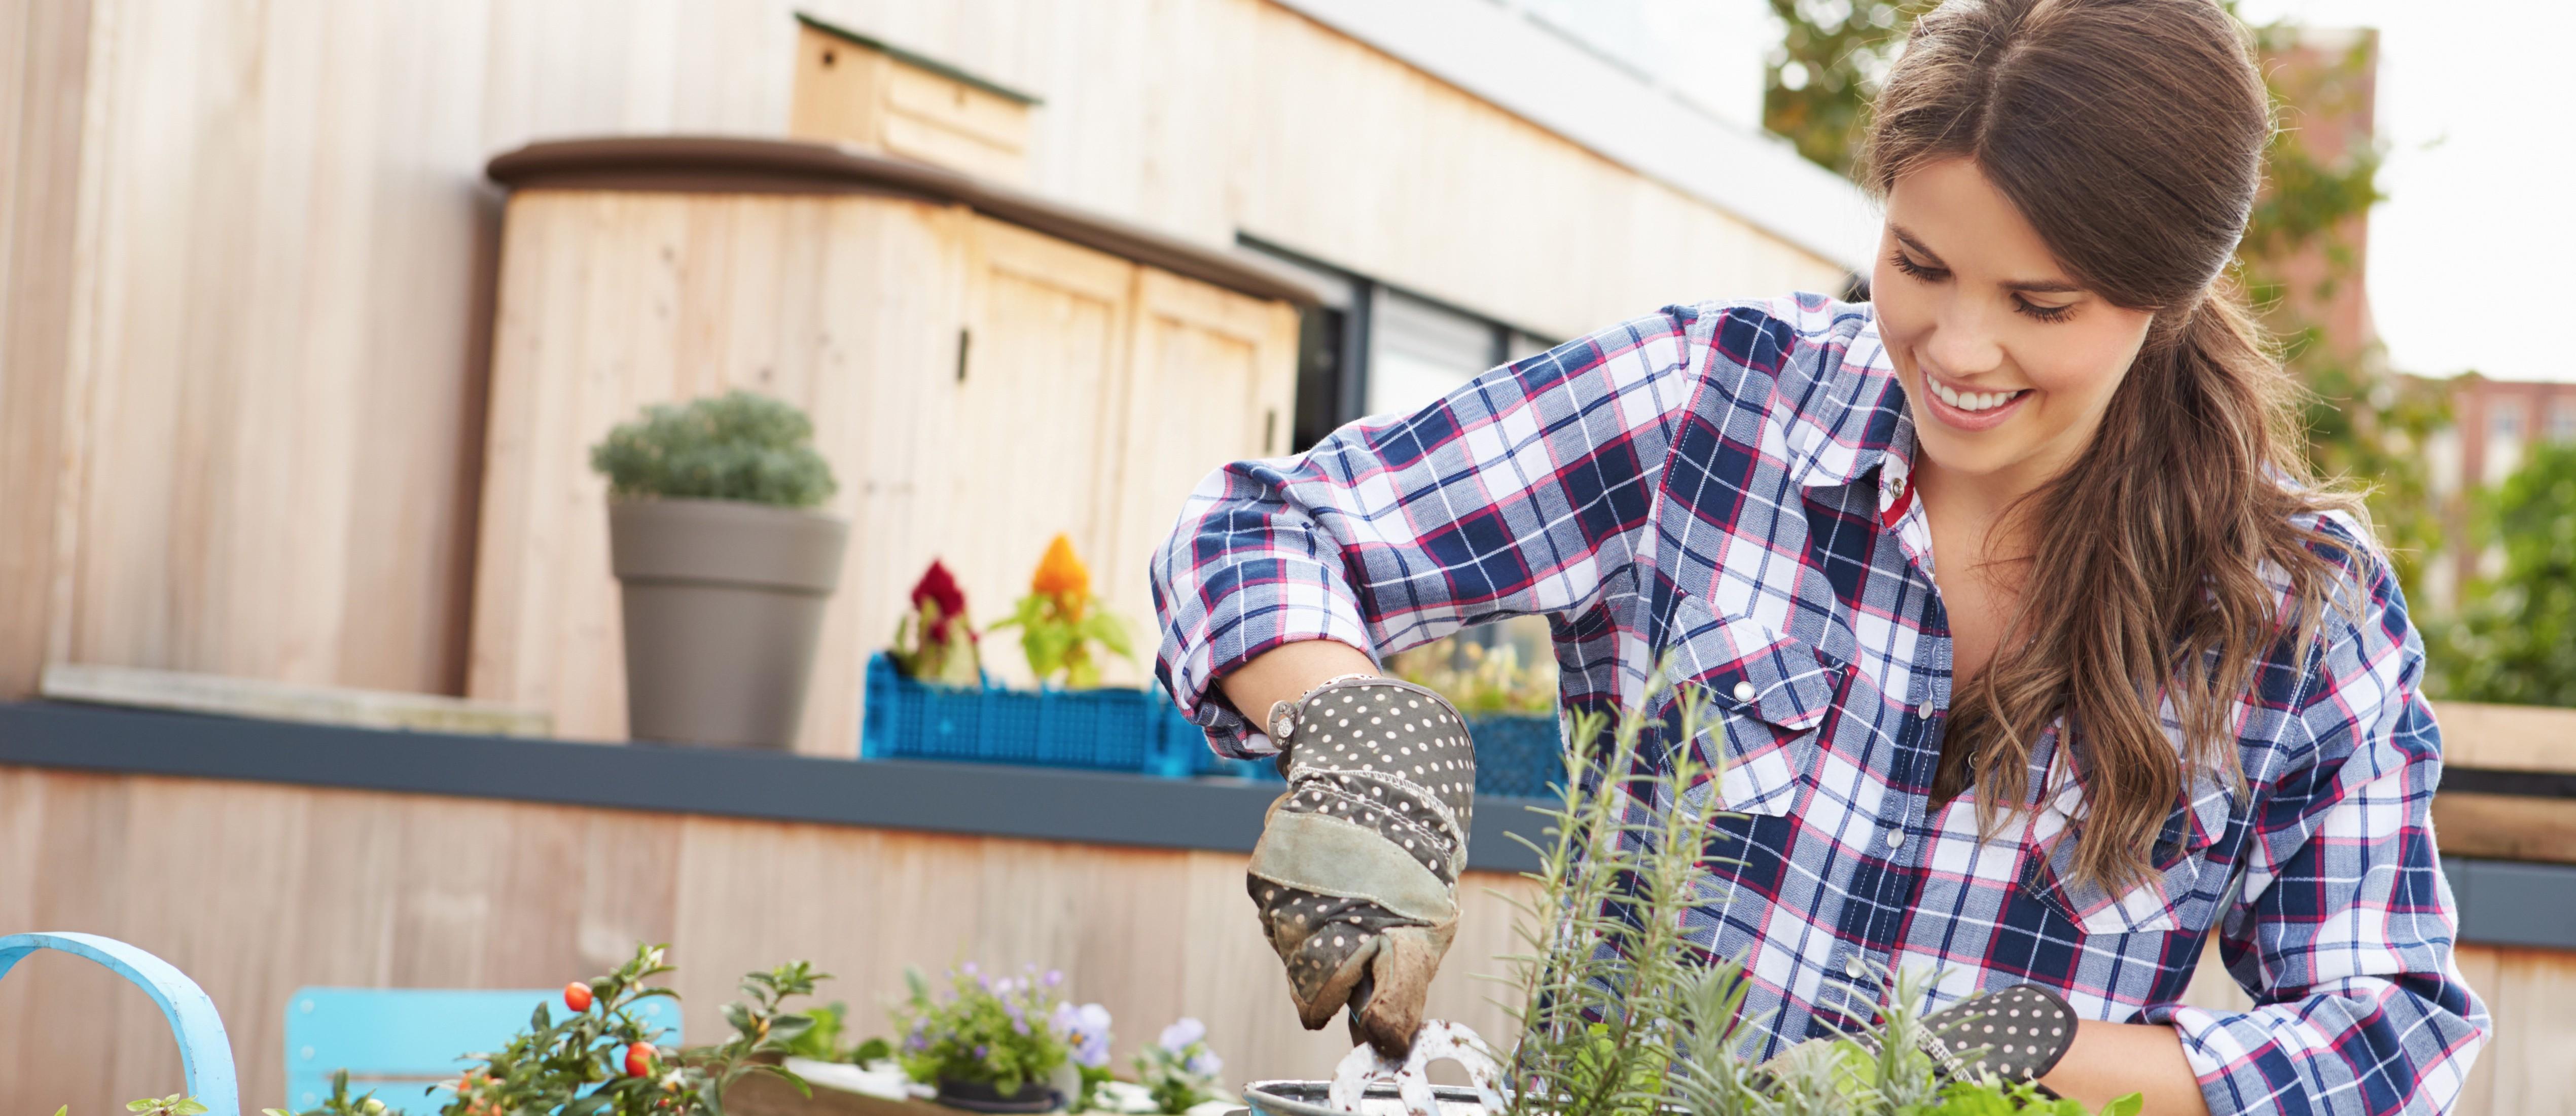 tips gardening avoid aches pains